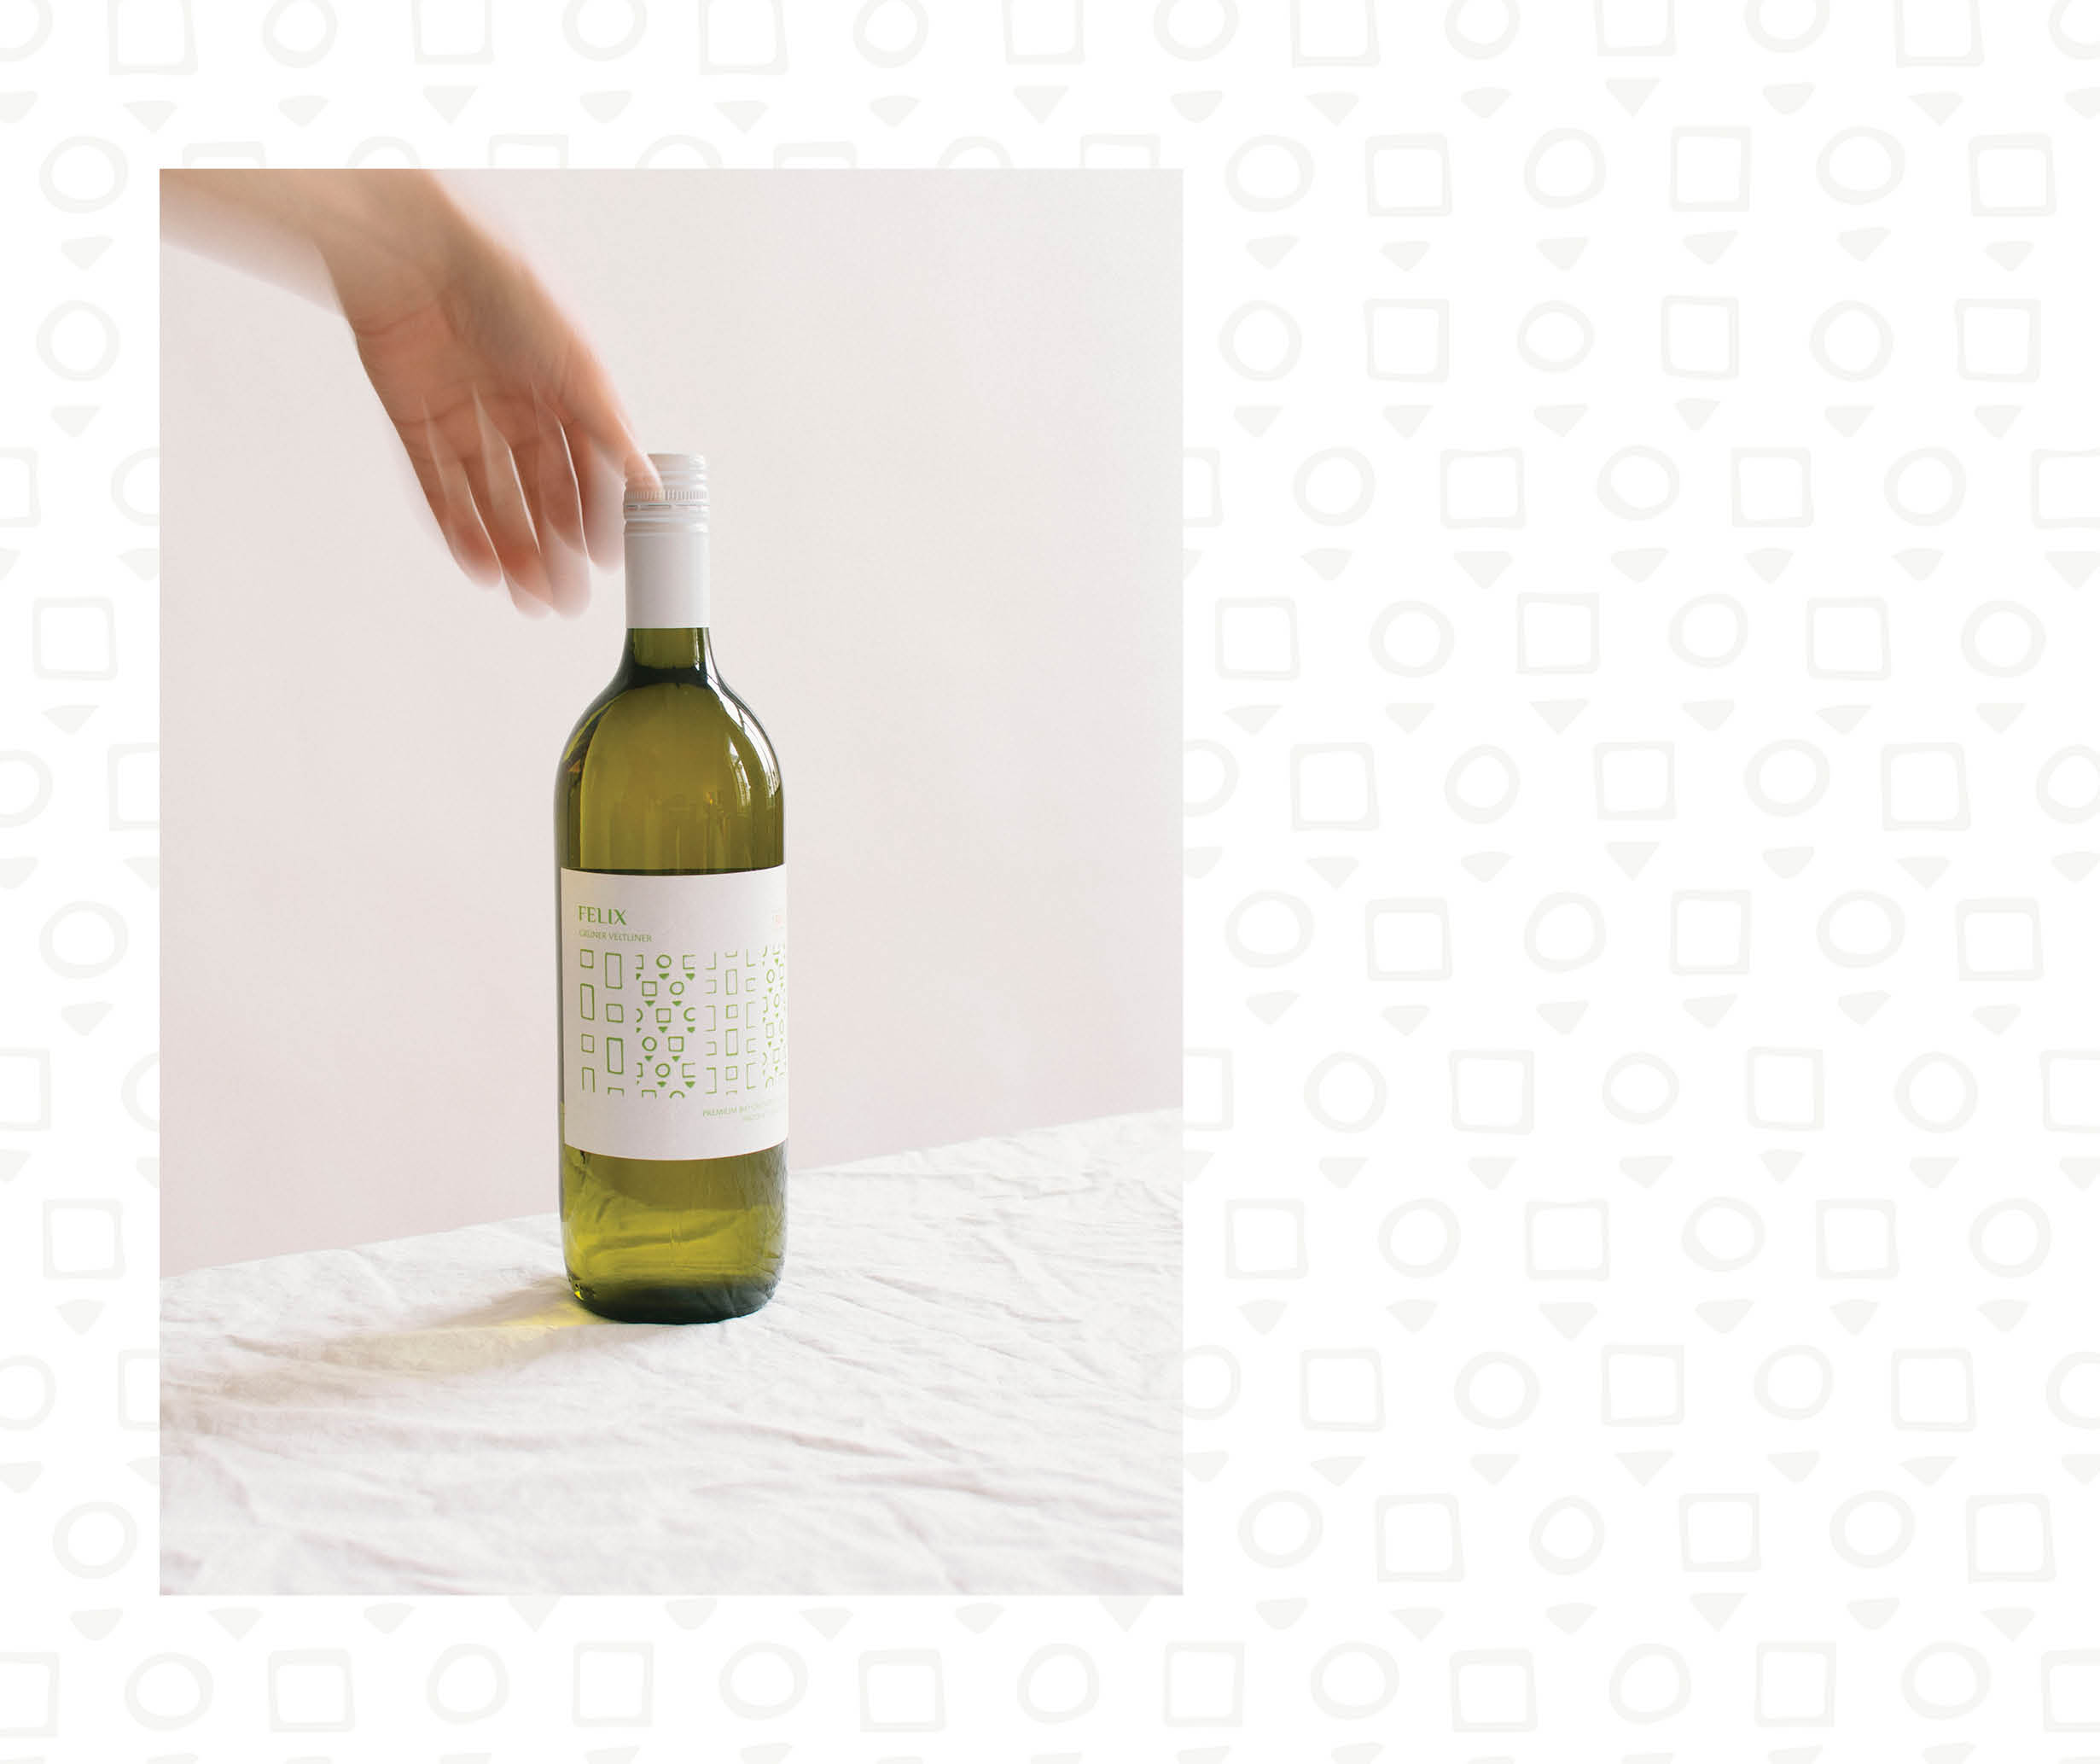 Felix Gruner Veltliner Wine Label Design by Magdalena Weiss (Winemonger Imports California)